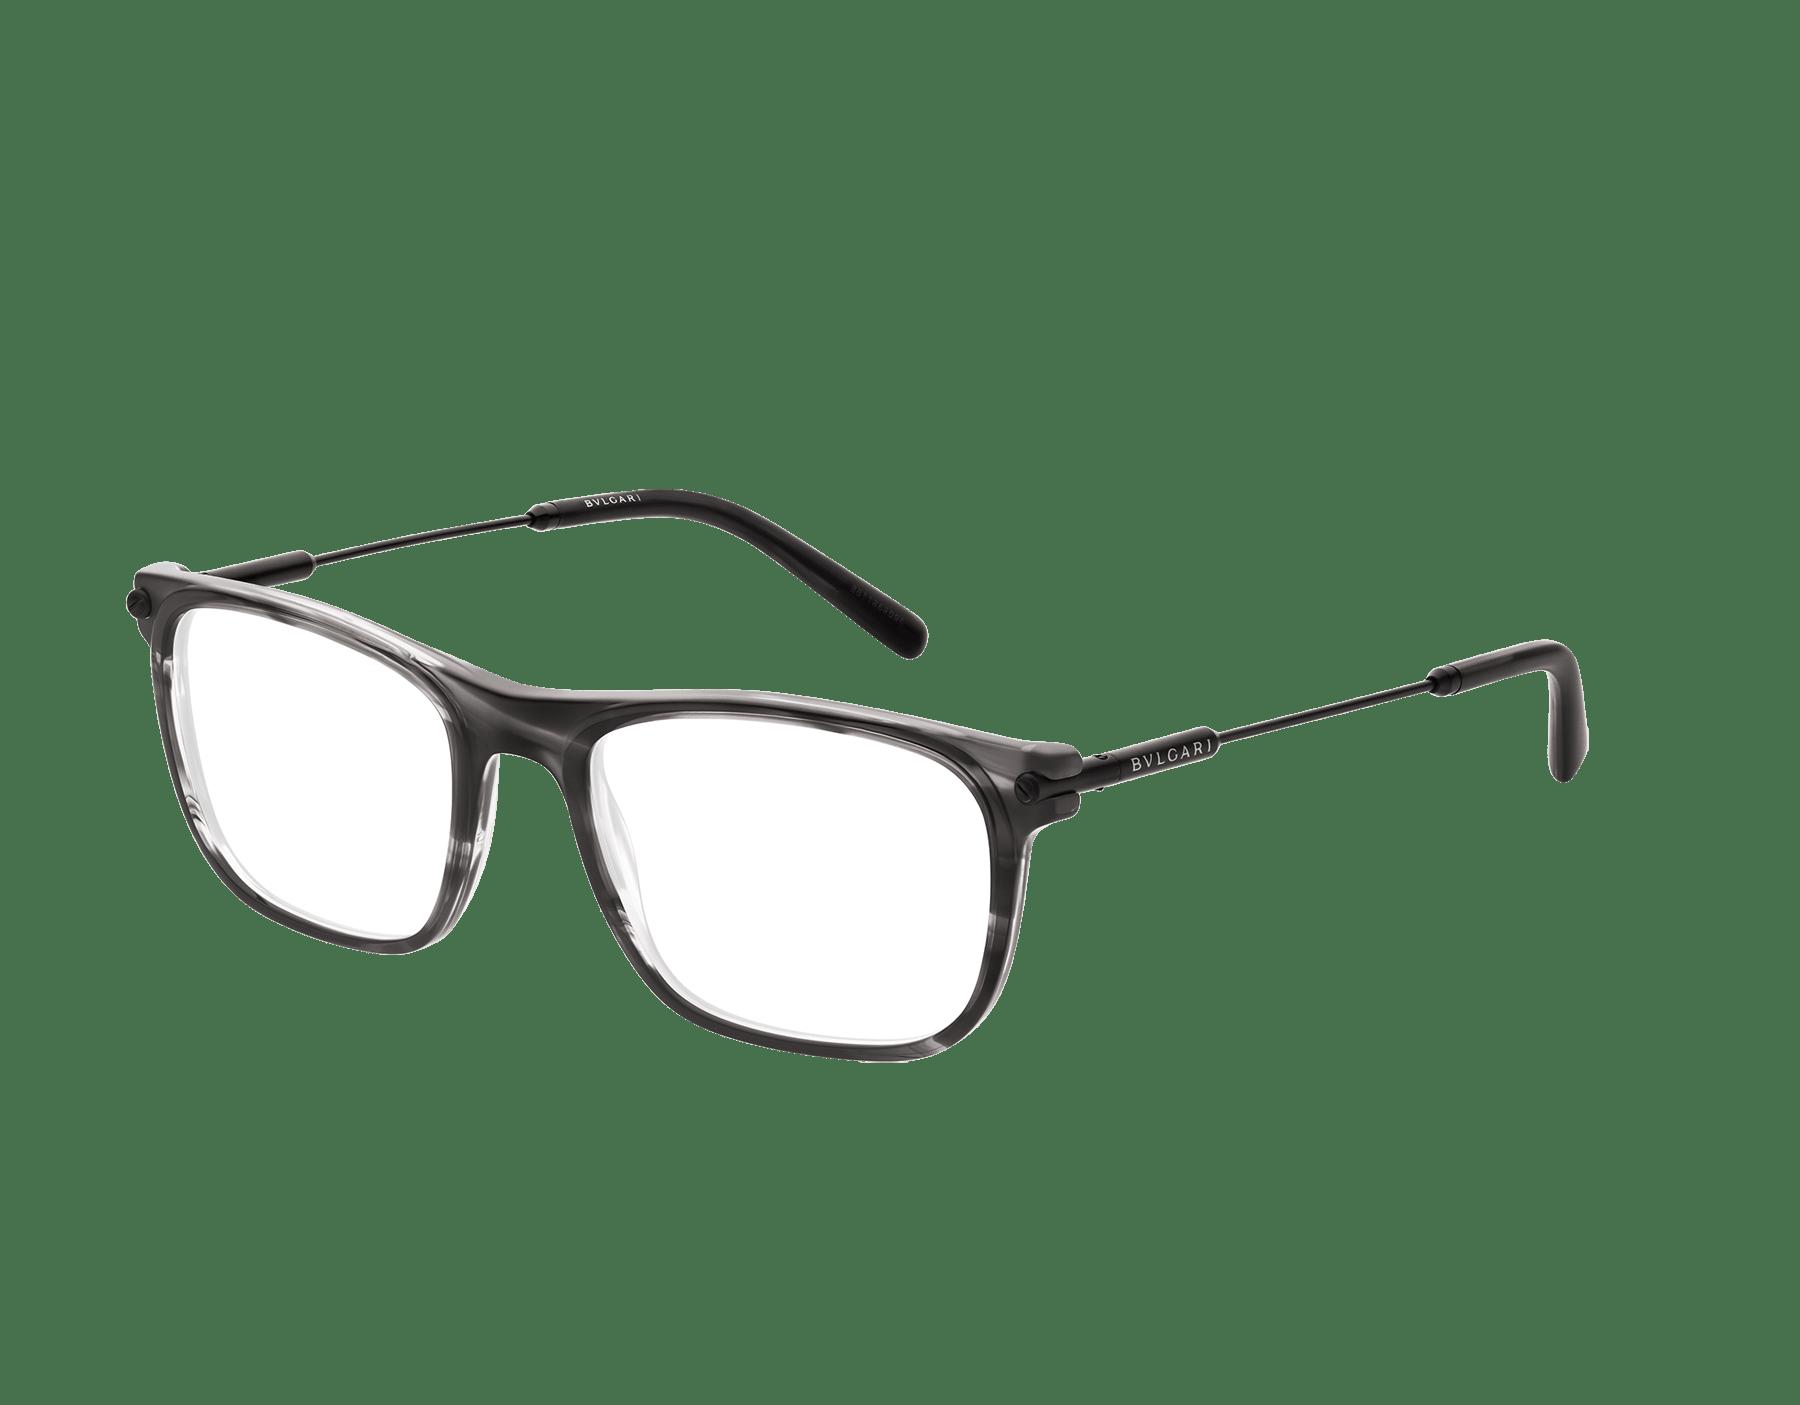 Diagono rectangular acetate eyeglasses. 903634 image 1